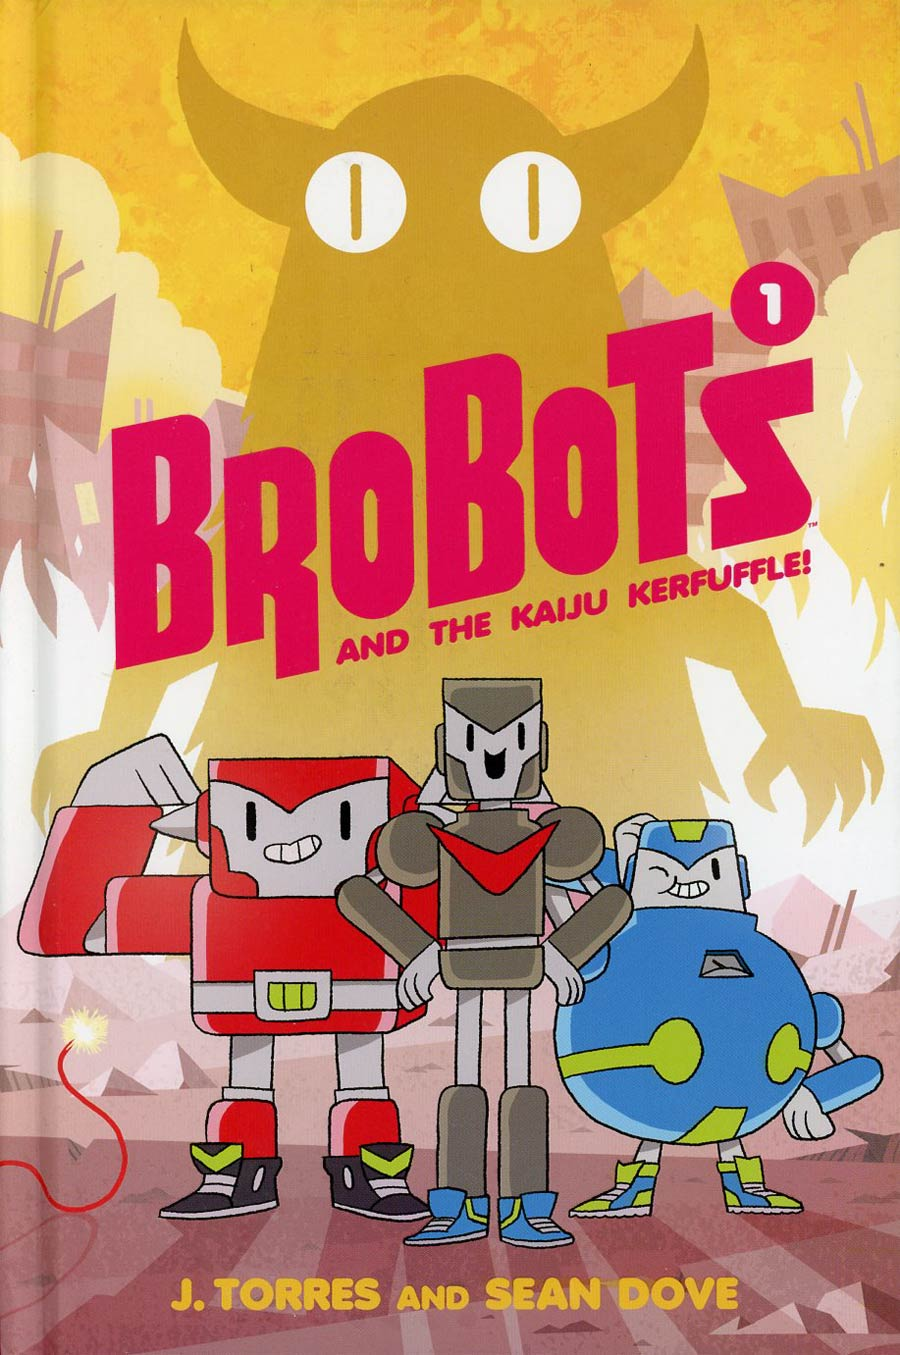 Brobots Vol 1 Brobots And The Kaiju Kerfuffle HC